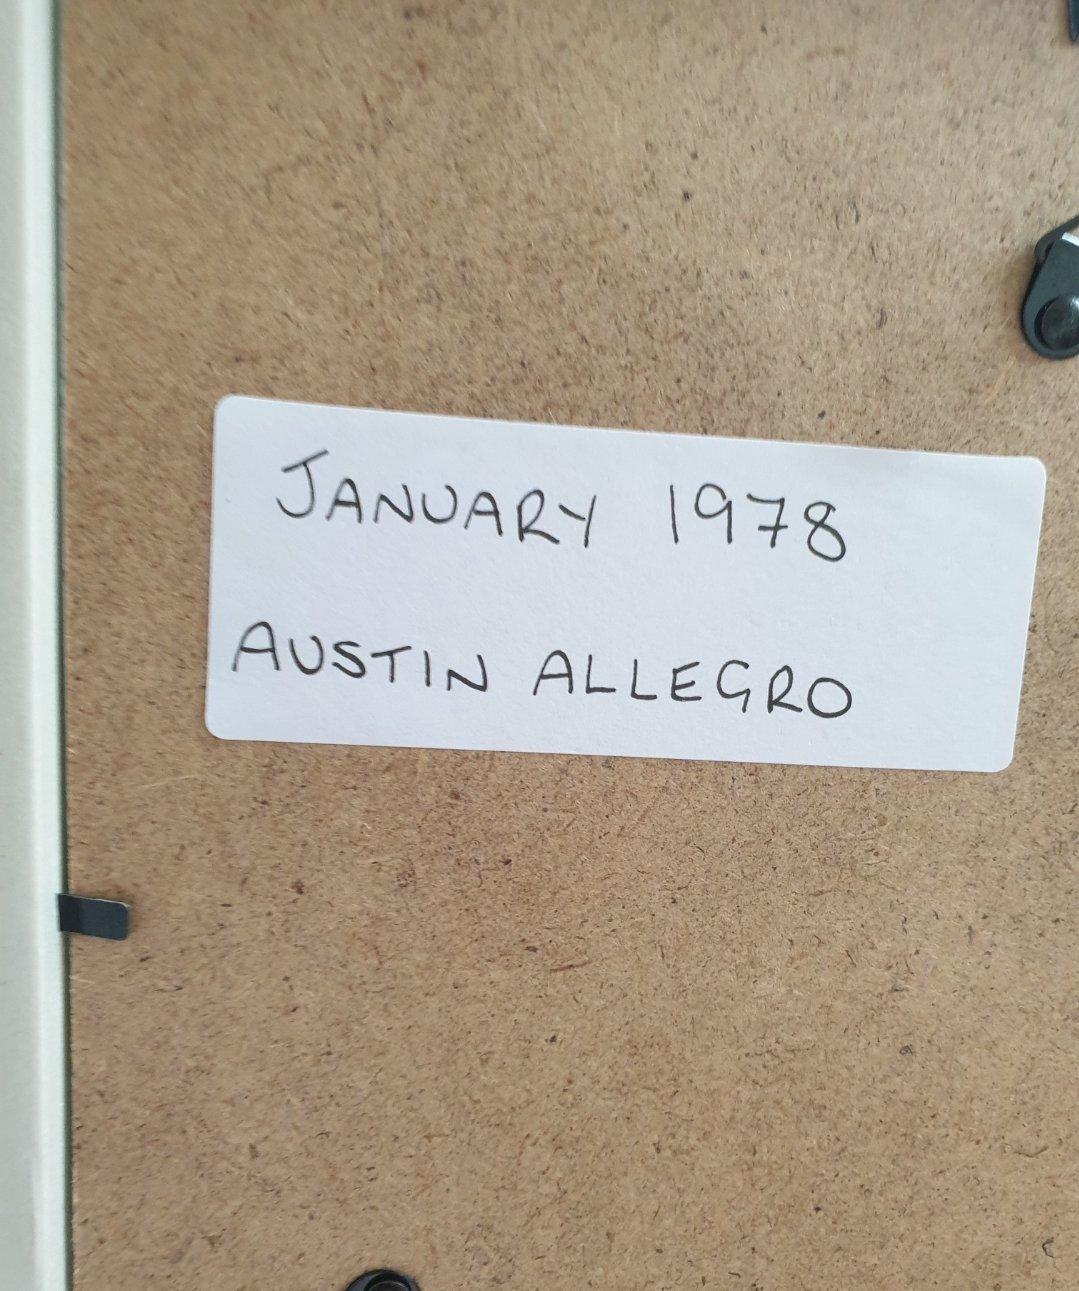 1978 Original Austin Allegro Framed Advert For Sale (picture 2 of 2)